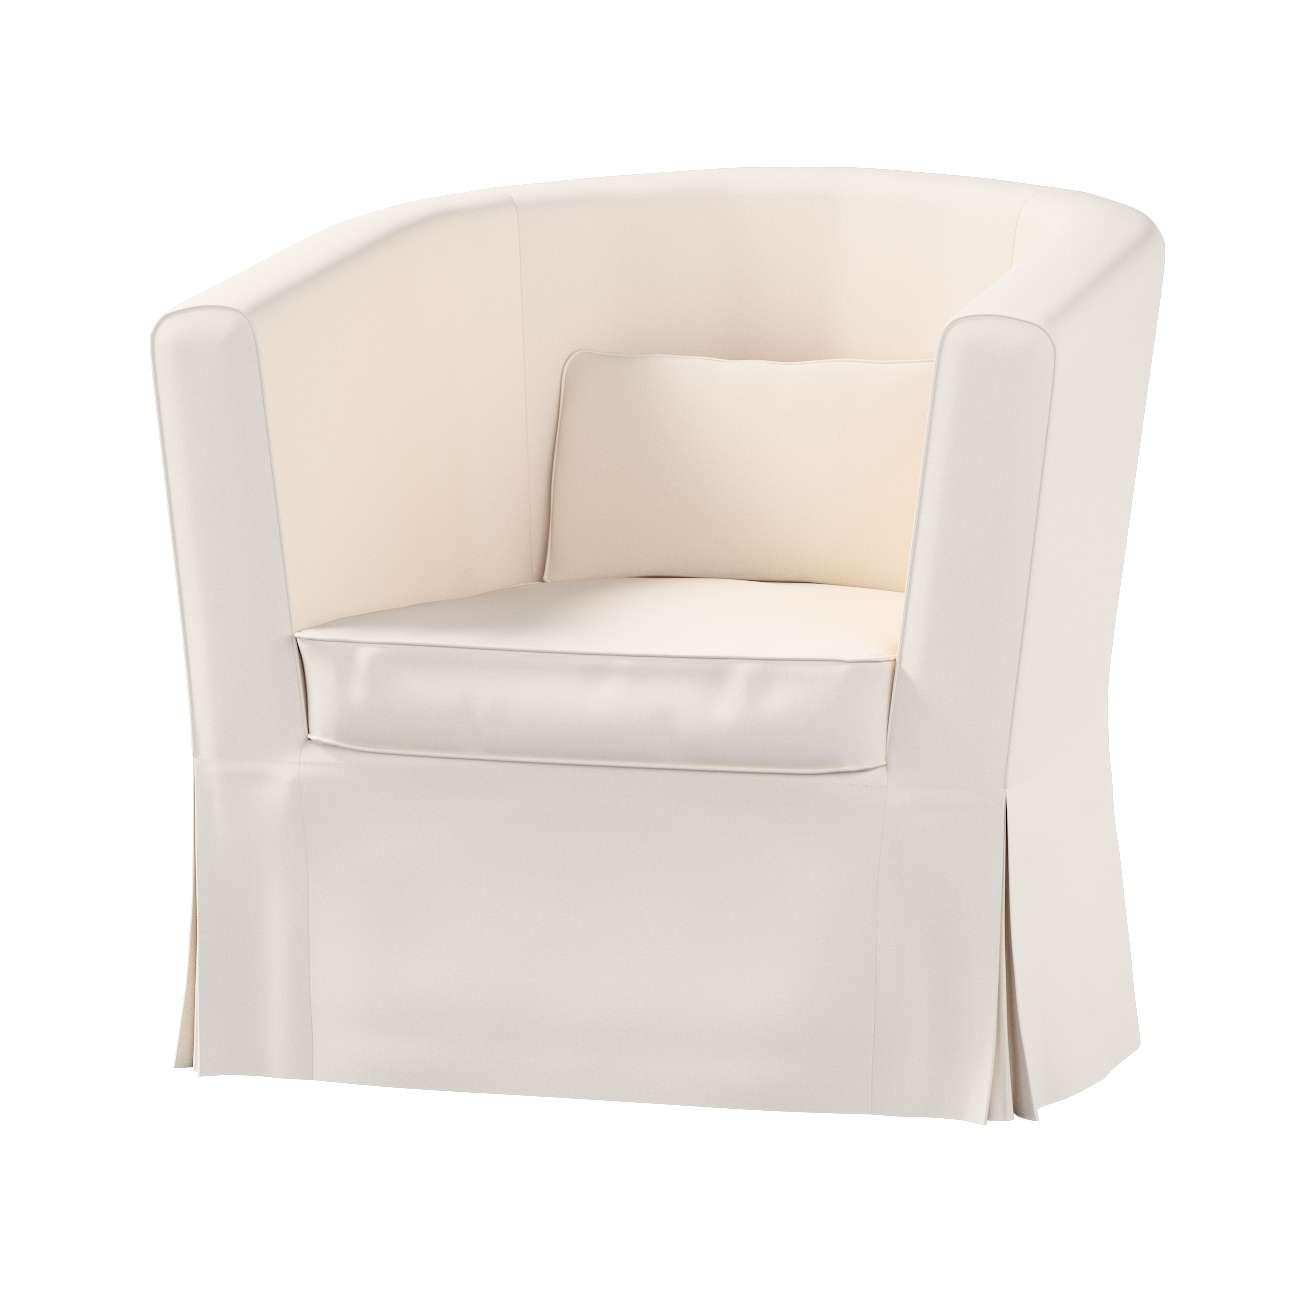 ektorp dekoria. Black Bedroom Furniture Sets. Home Design Ideas